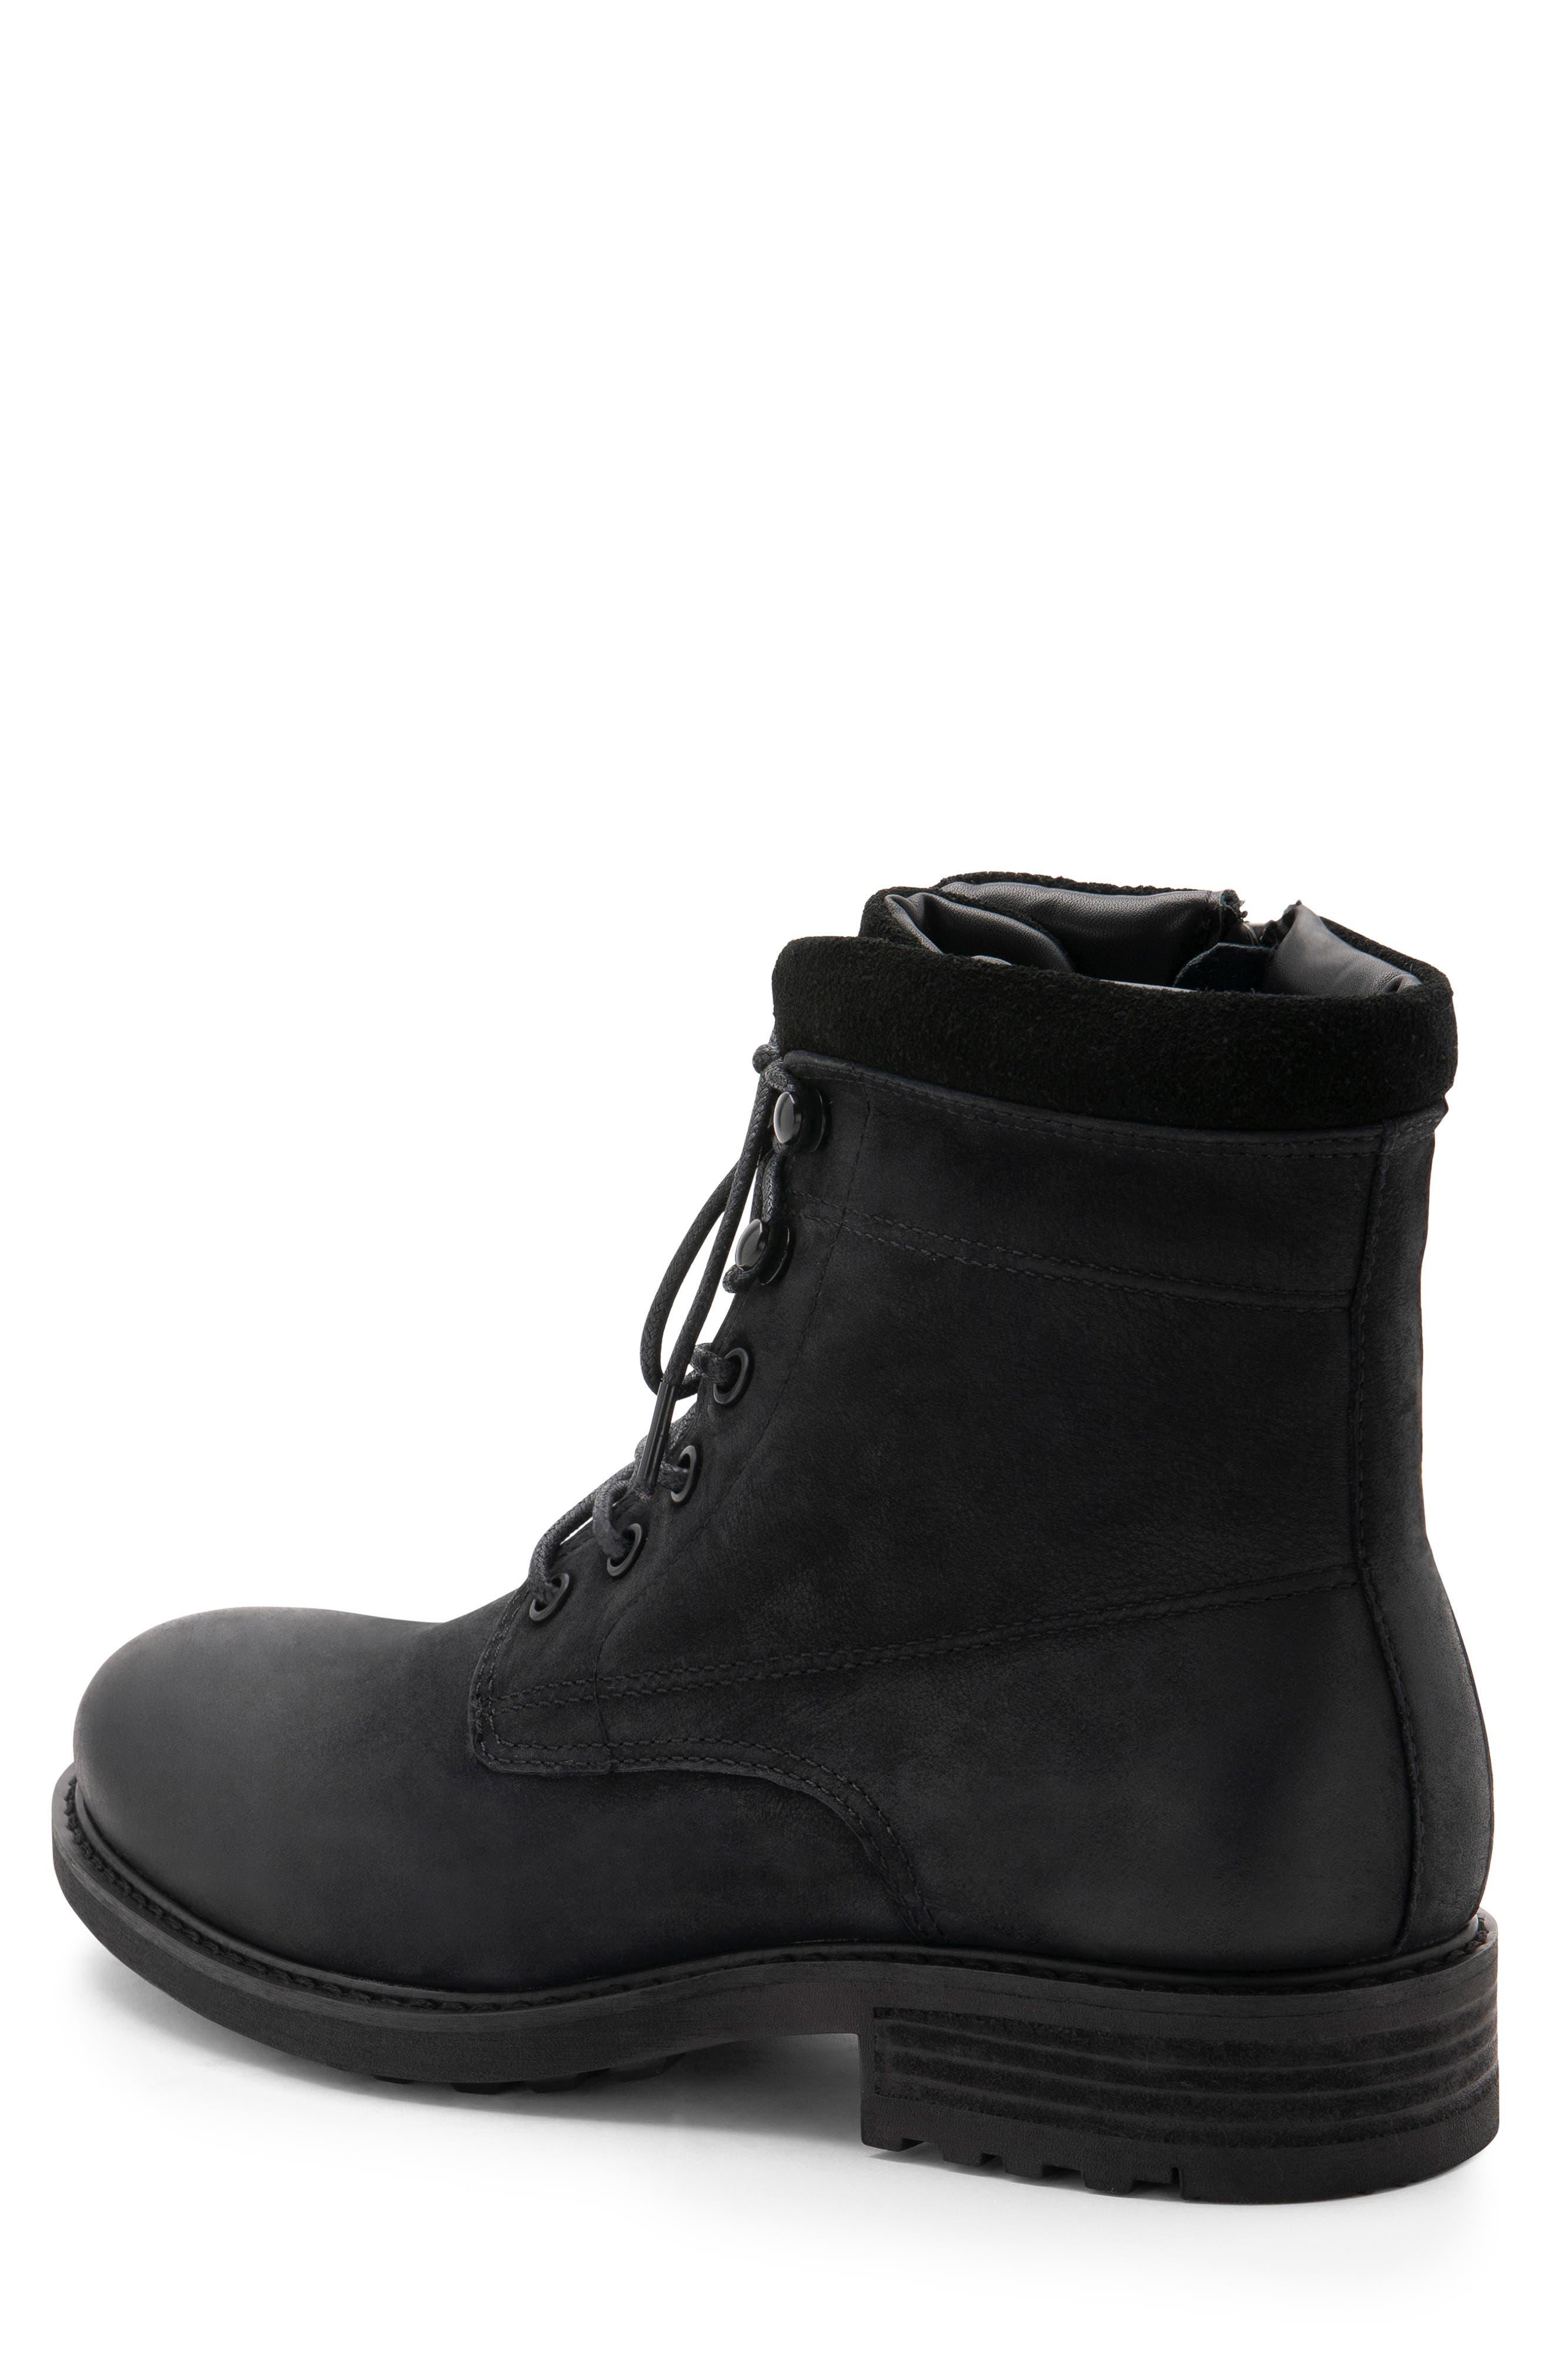 Patton Waterproof Plain Toe Boot,                             Alternate thumbnail 2, color,                             BLACK NUBUCK